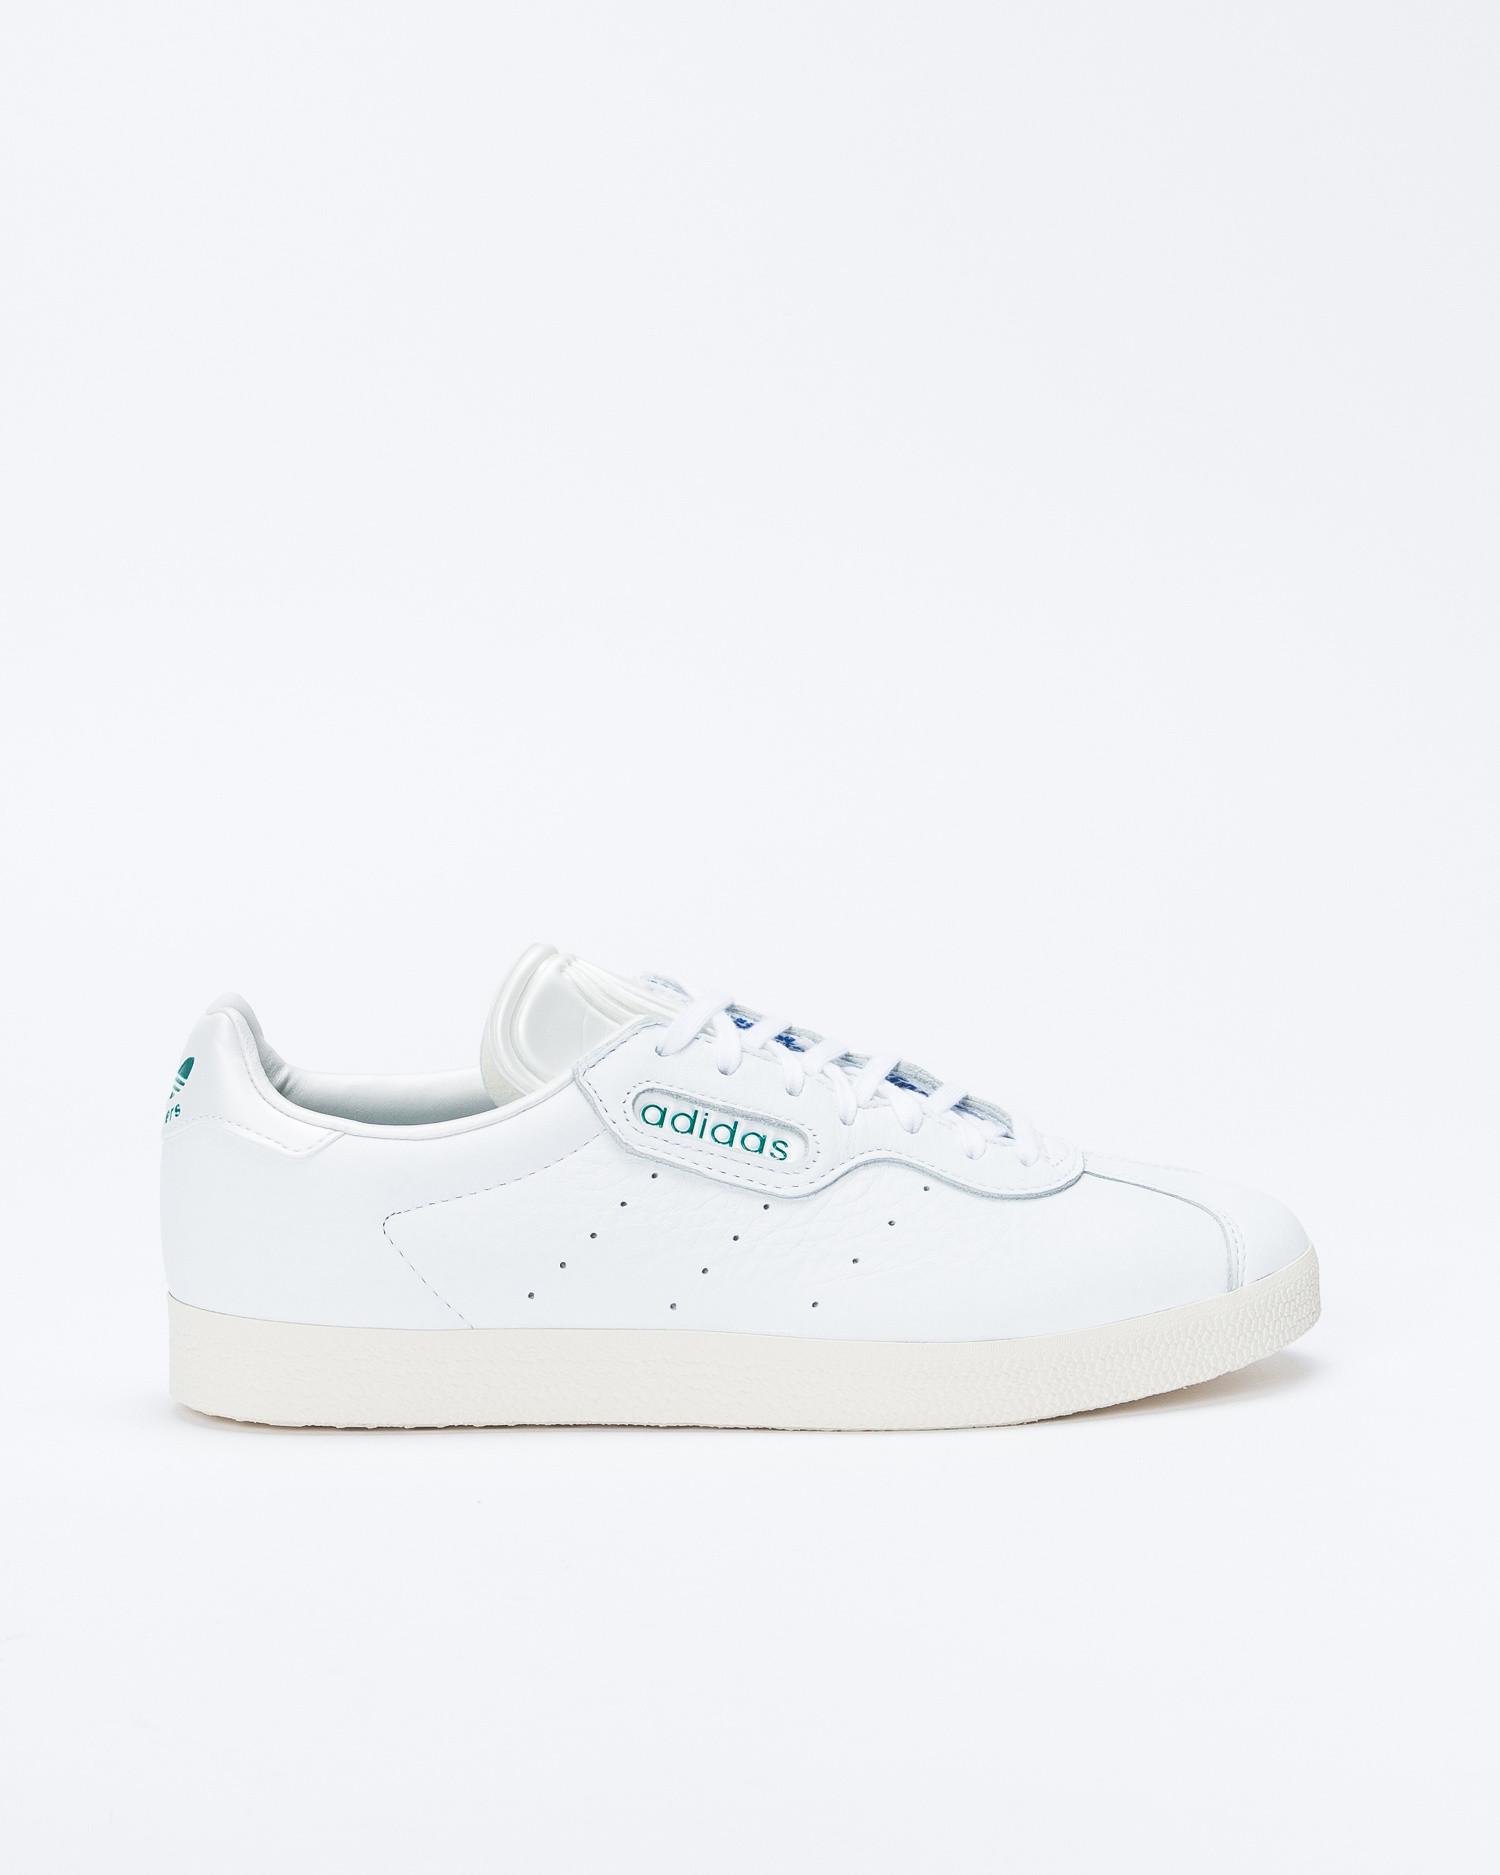 adidas x Alltimers Gazelle Cloud White/Chalk White